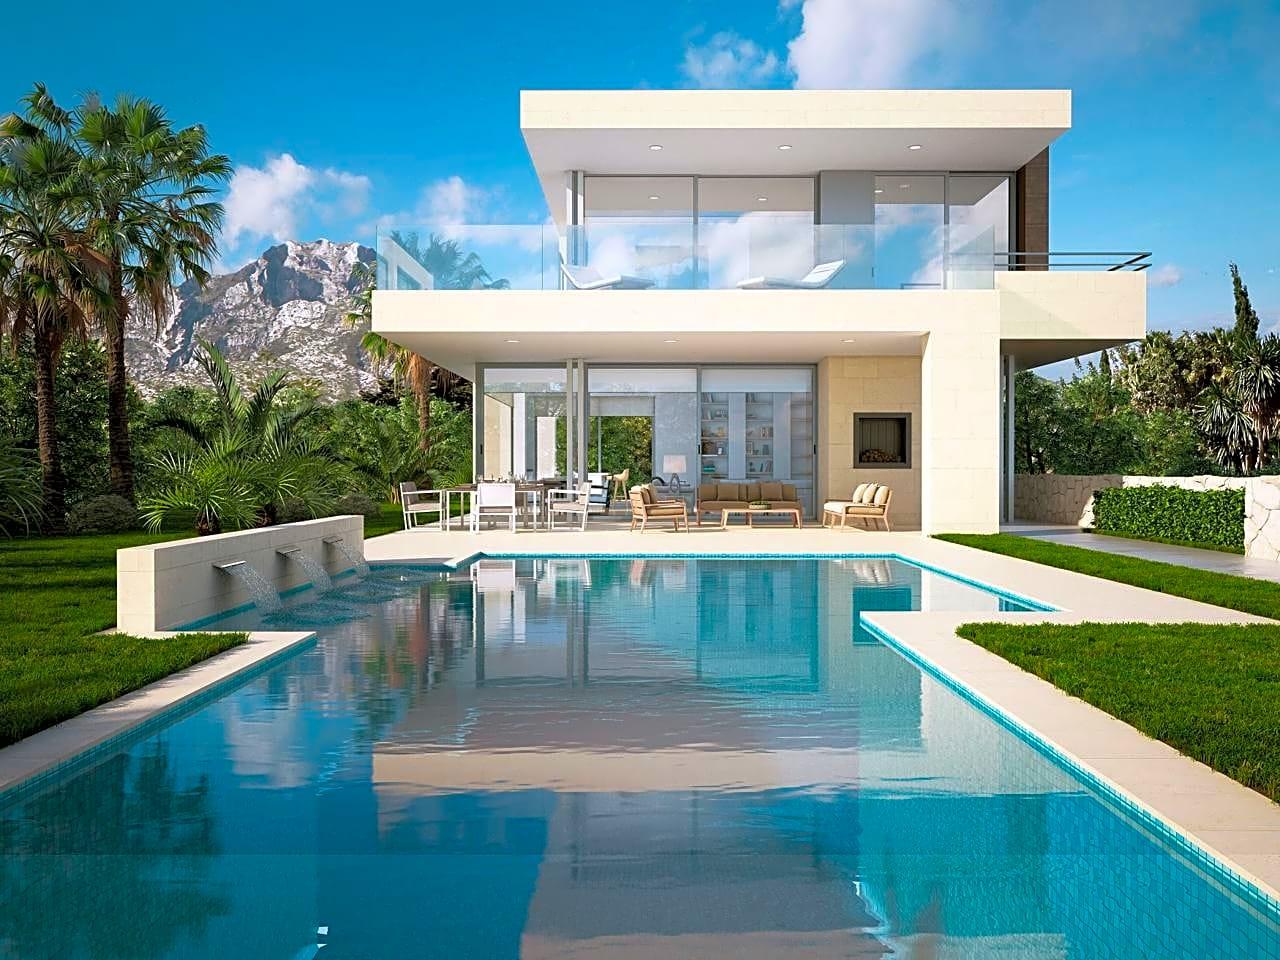 Marbella place casa chalet en venta en marbella de 625 m2 for Casa moderna bella faccia